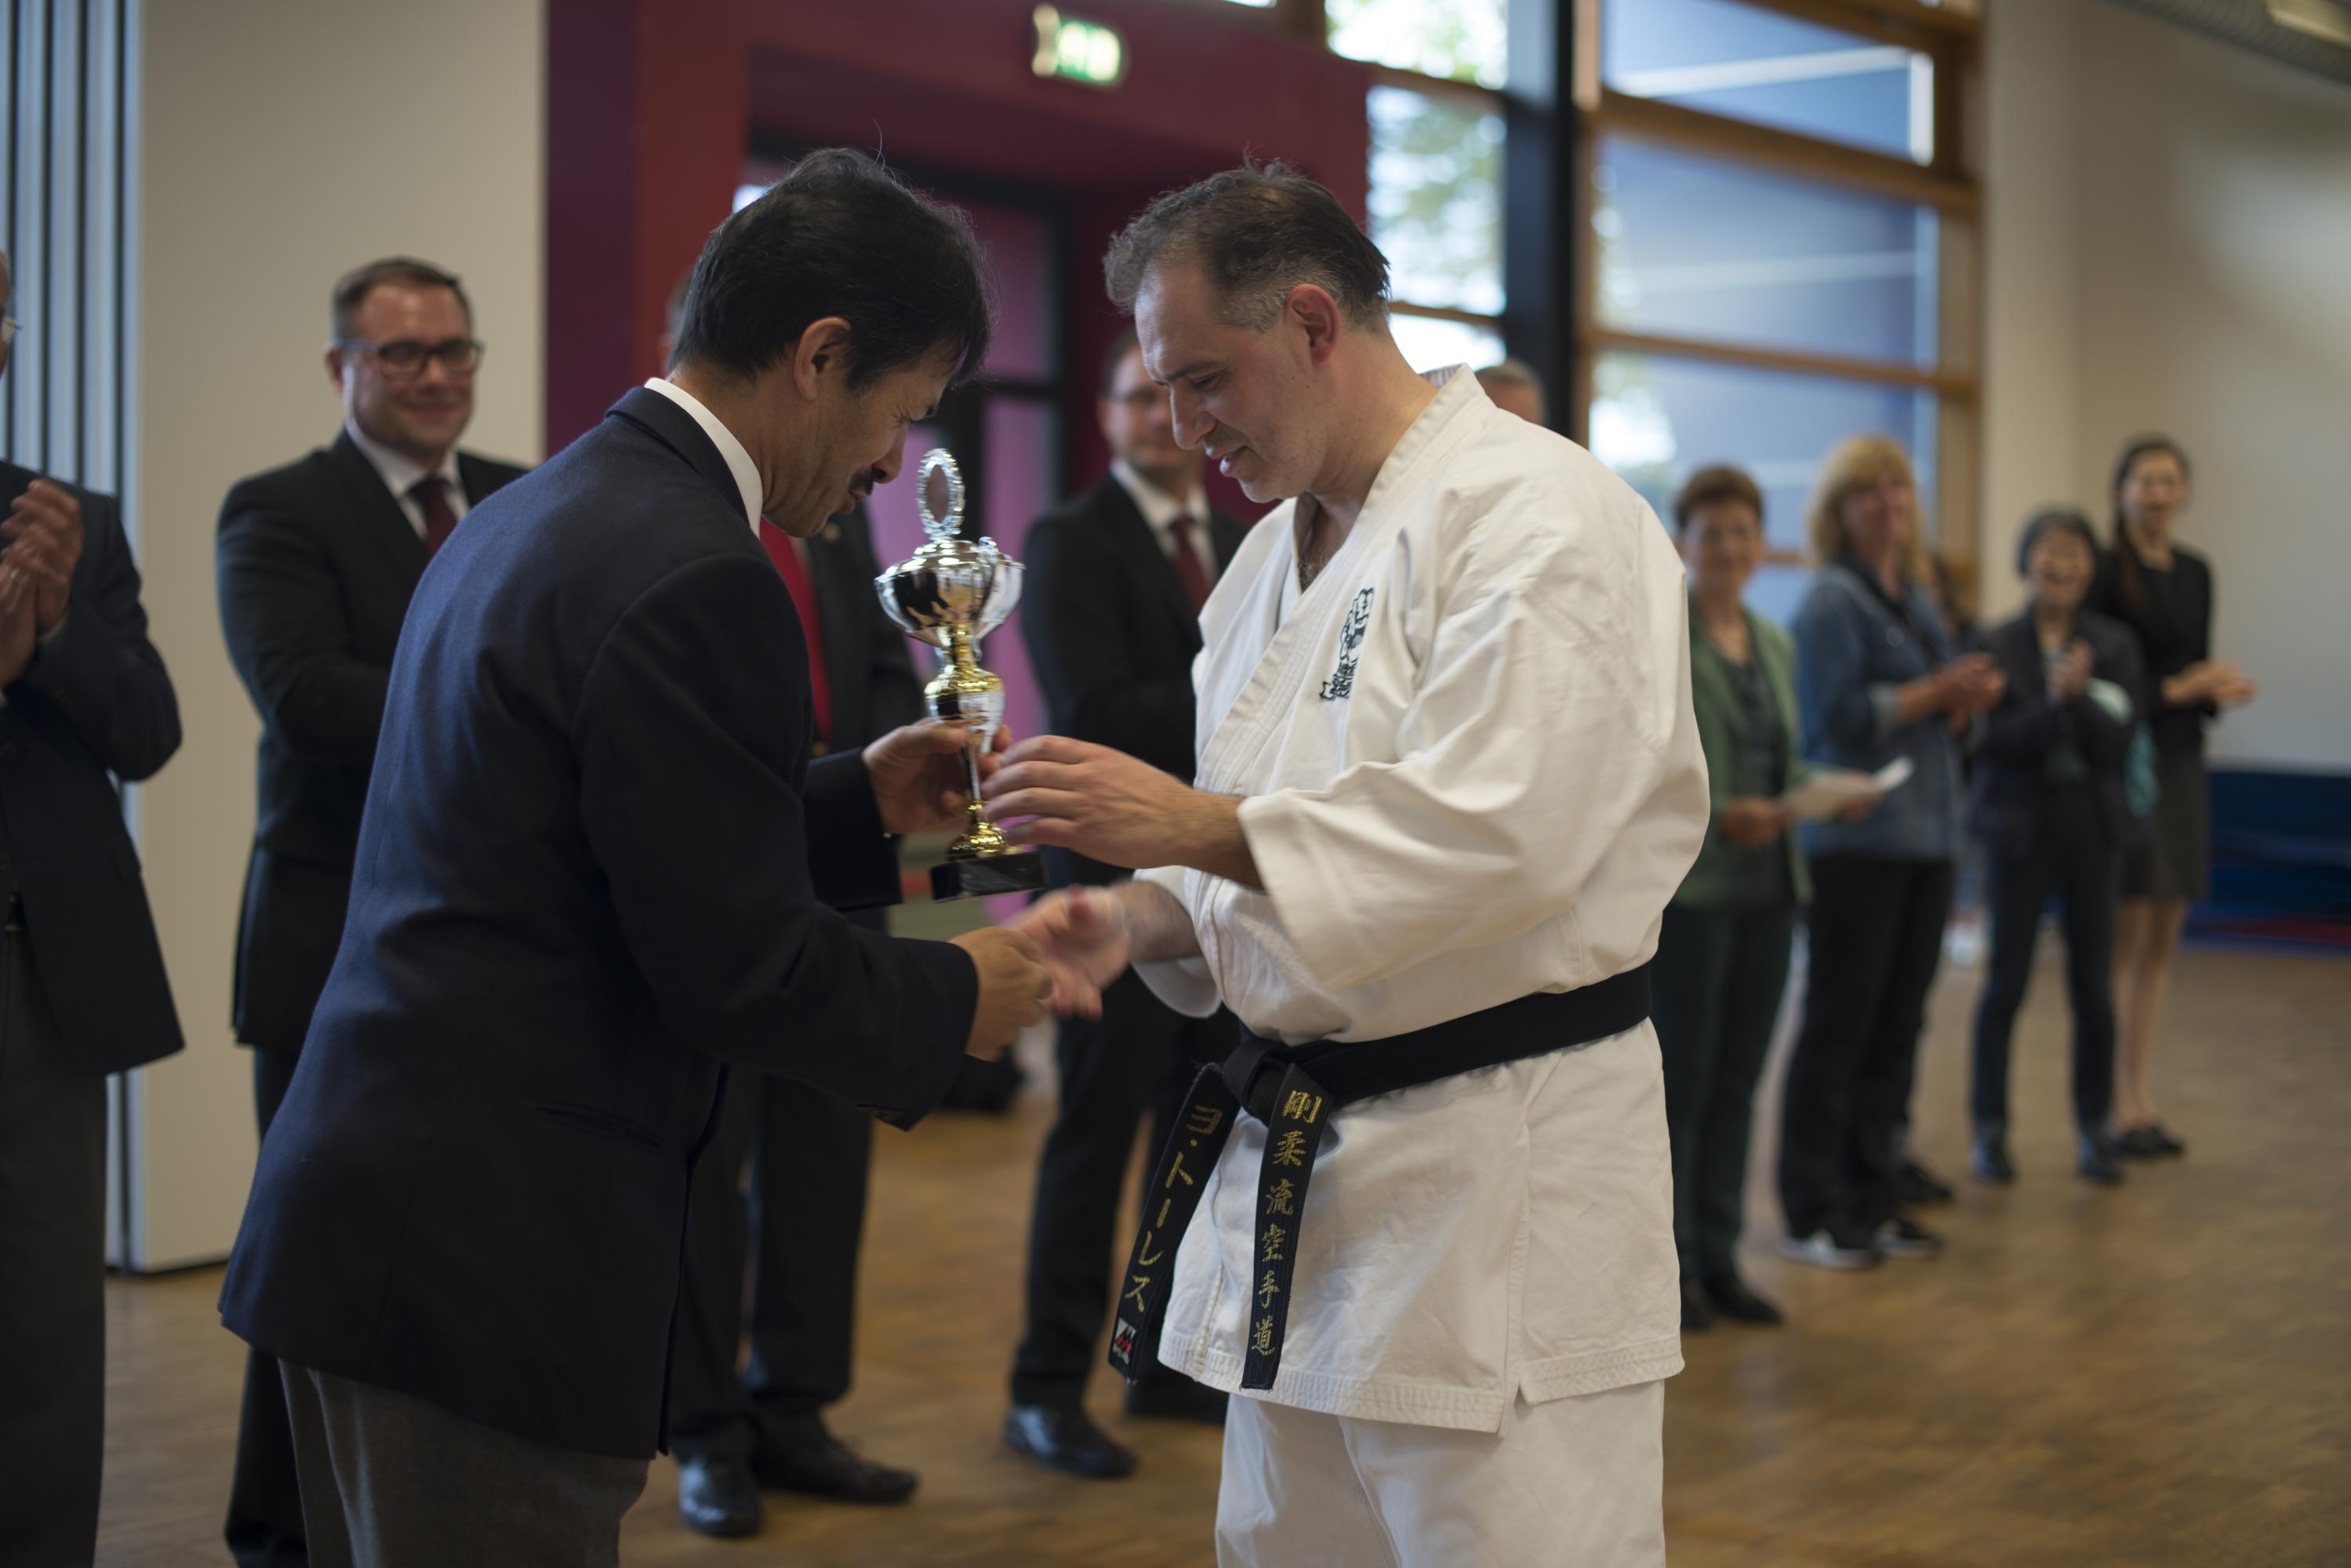 2016-04-26 Kata Turnier Kaarst 356